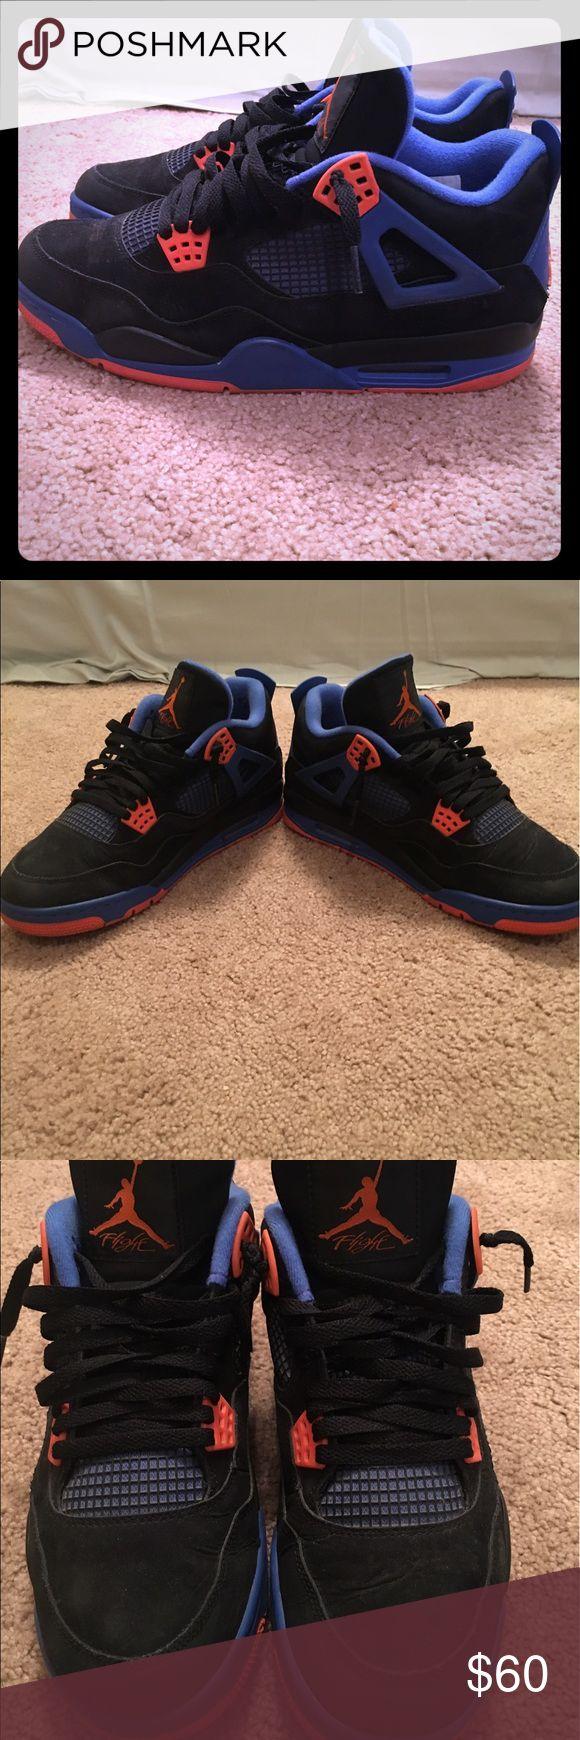 Exclusive Jordan 4 (Knicks) 8/10 condition. Worn about 5 times. Air Jordan Shoes Athletic Shoes